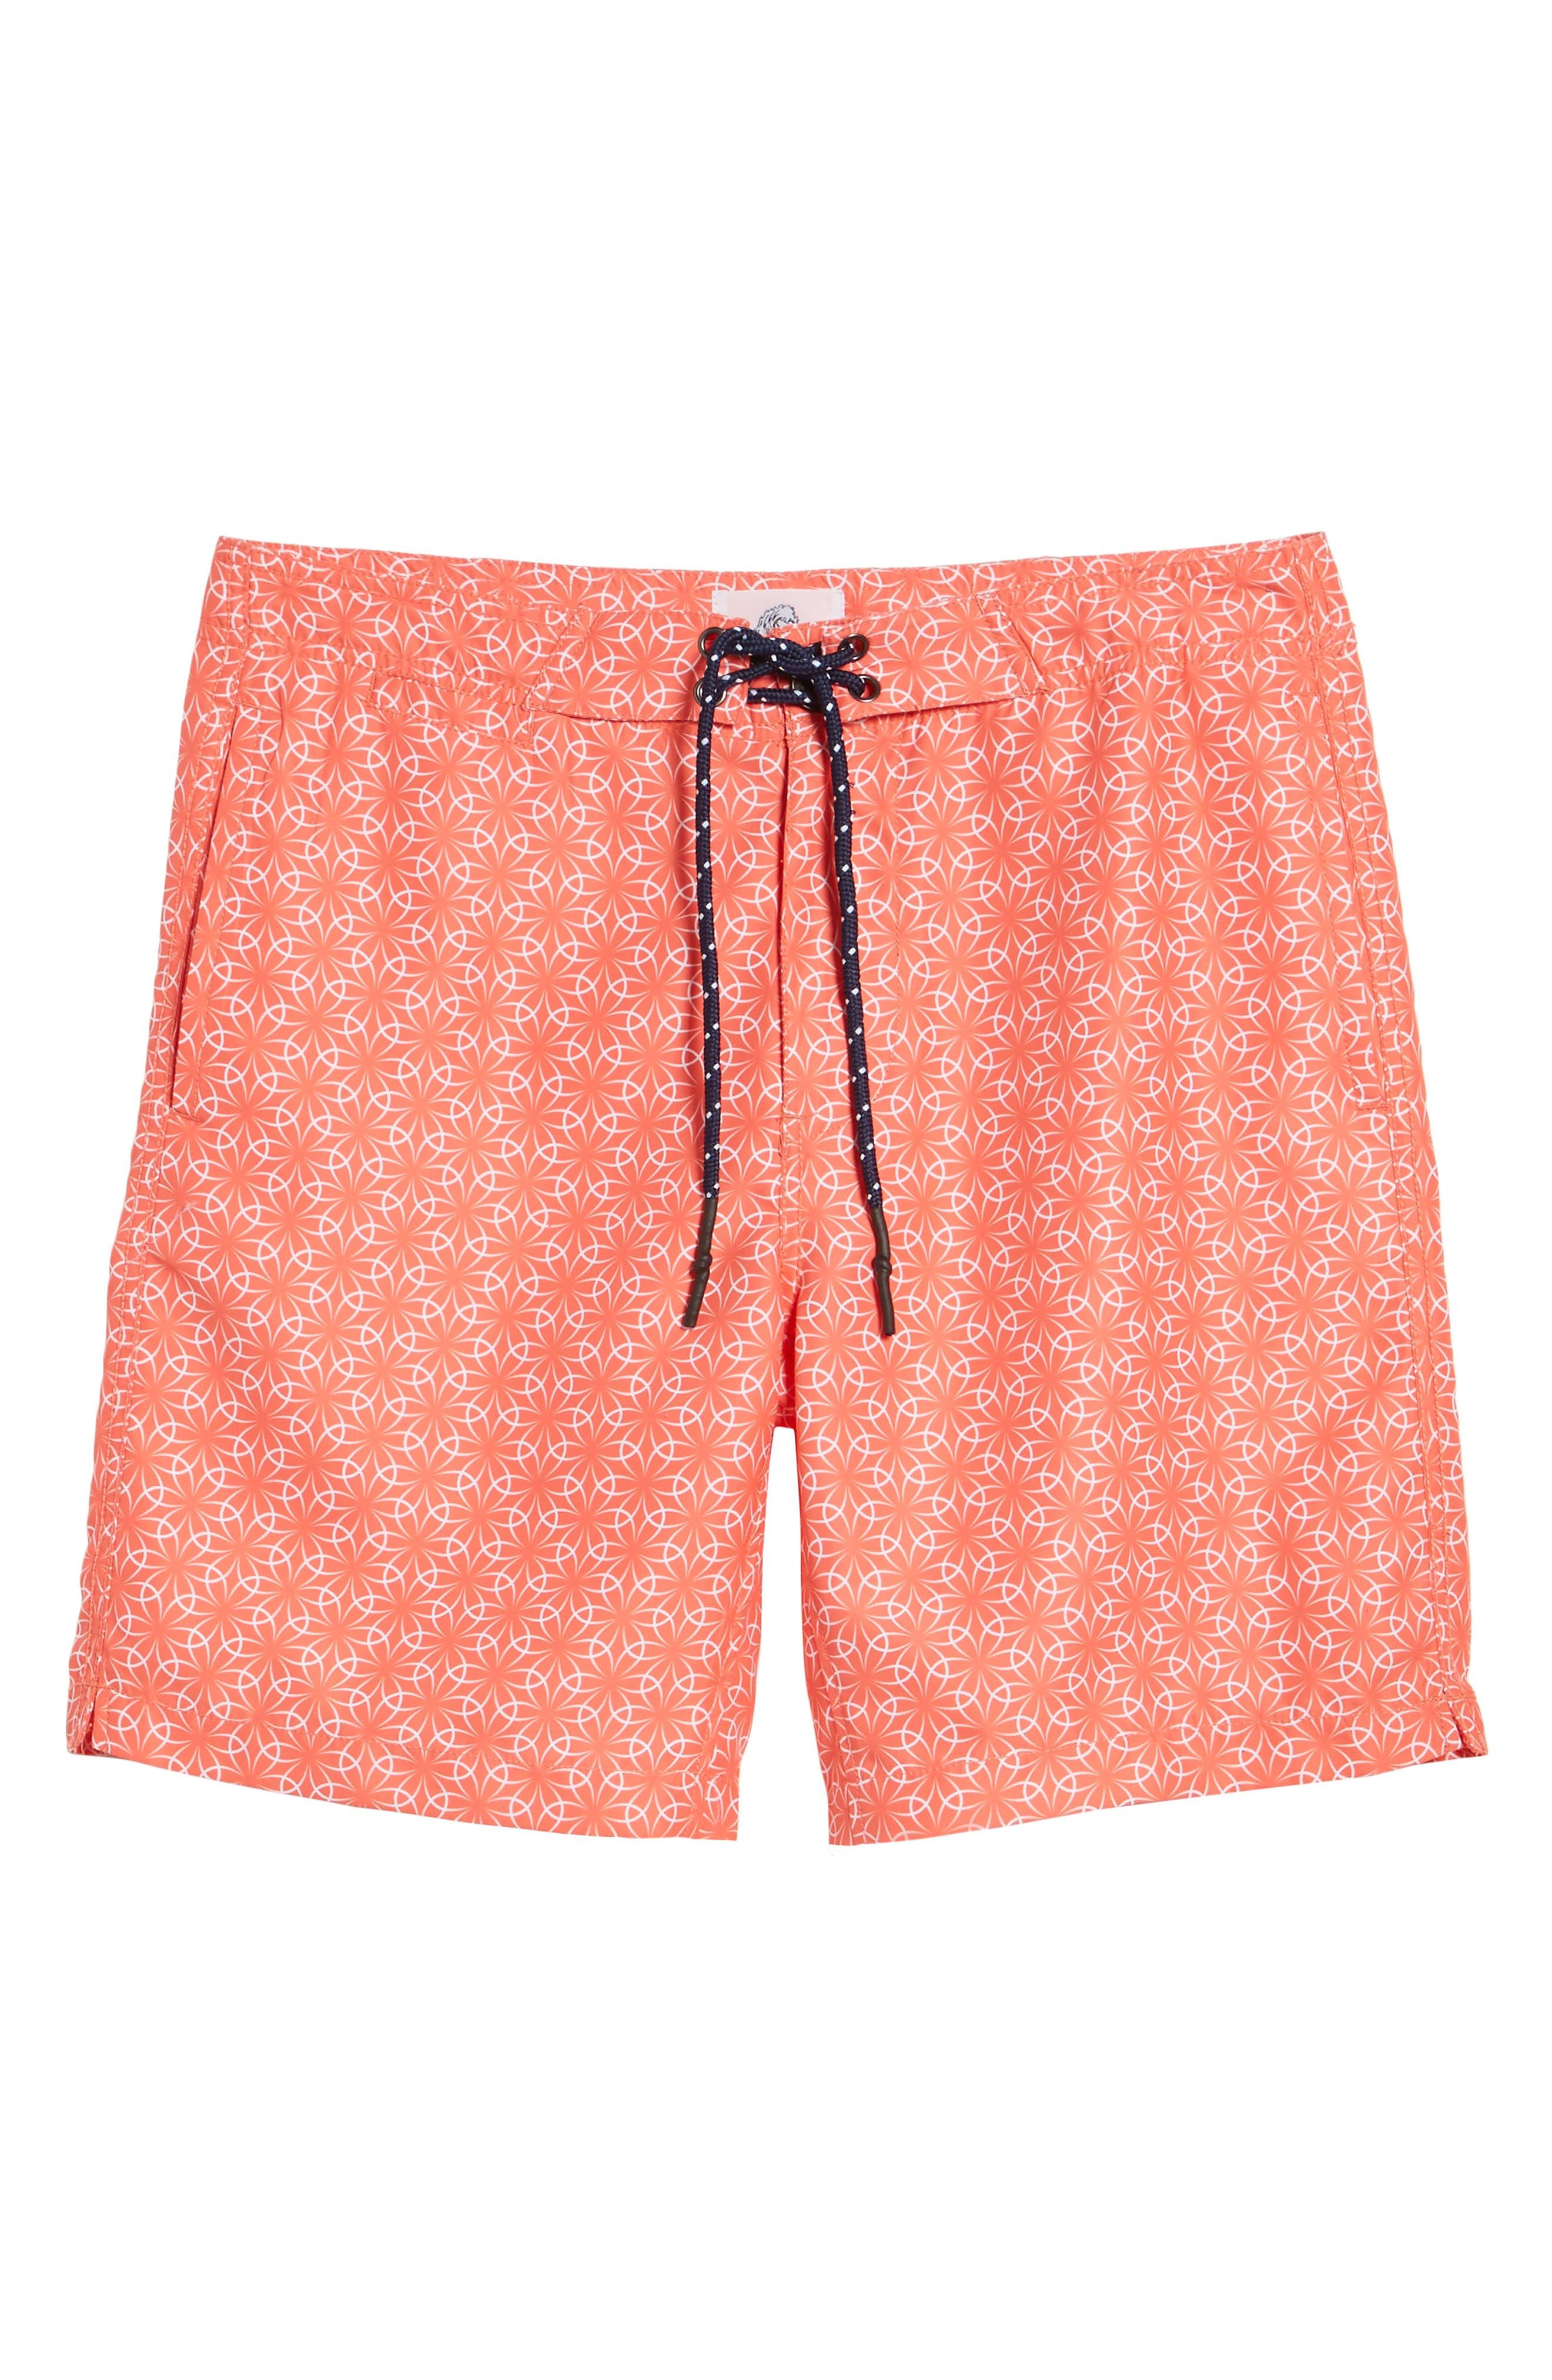 Gradient Flower Board Shorts,                             Alternate thumbnail 6, color,